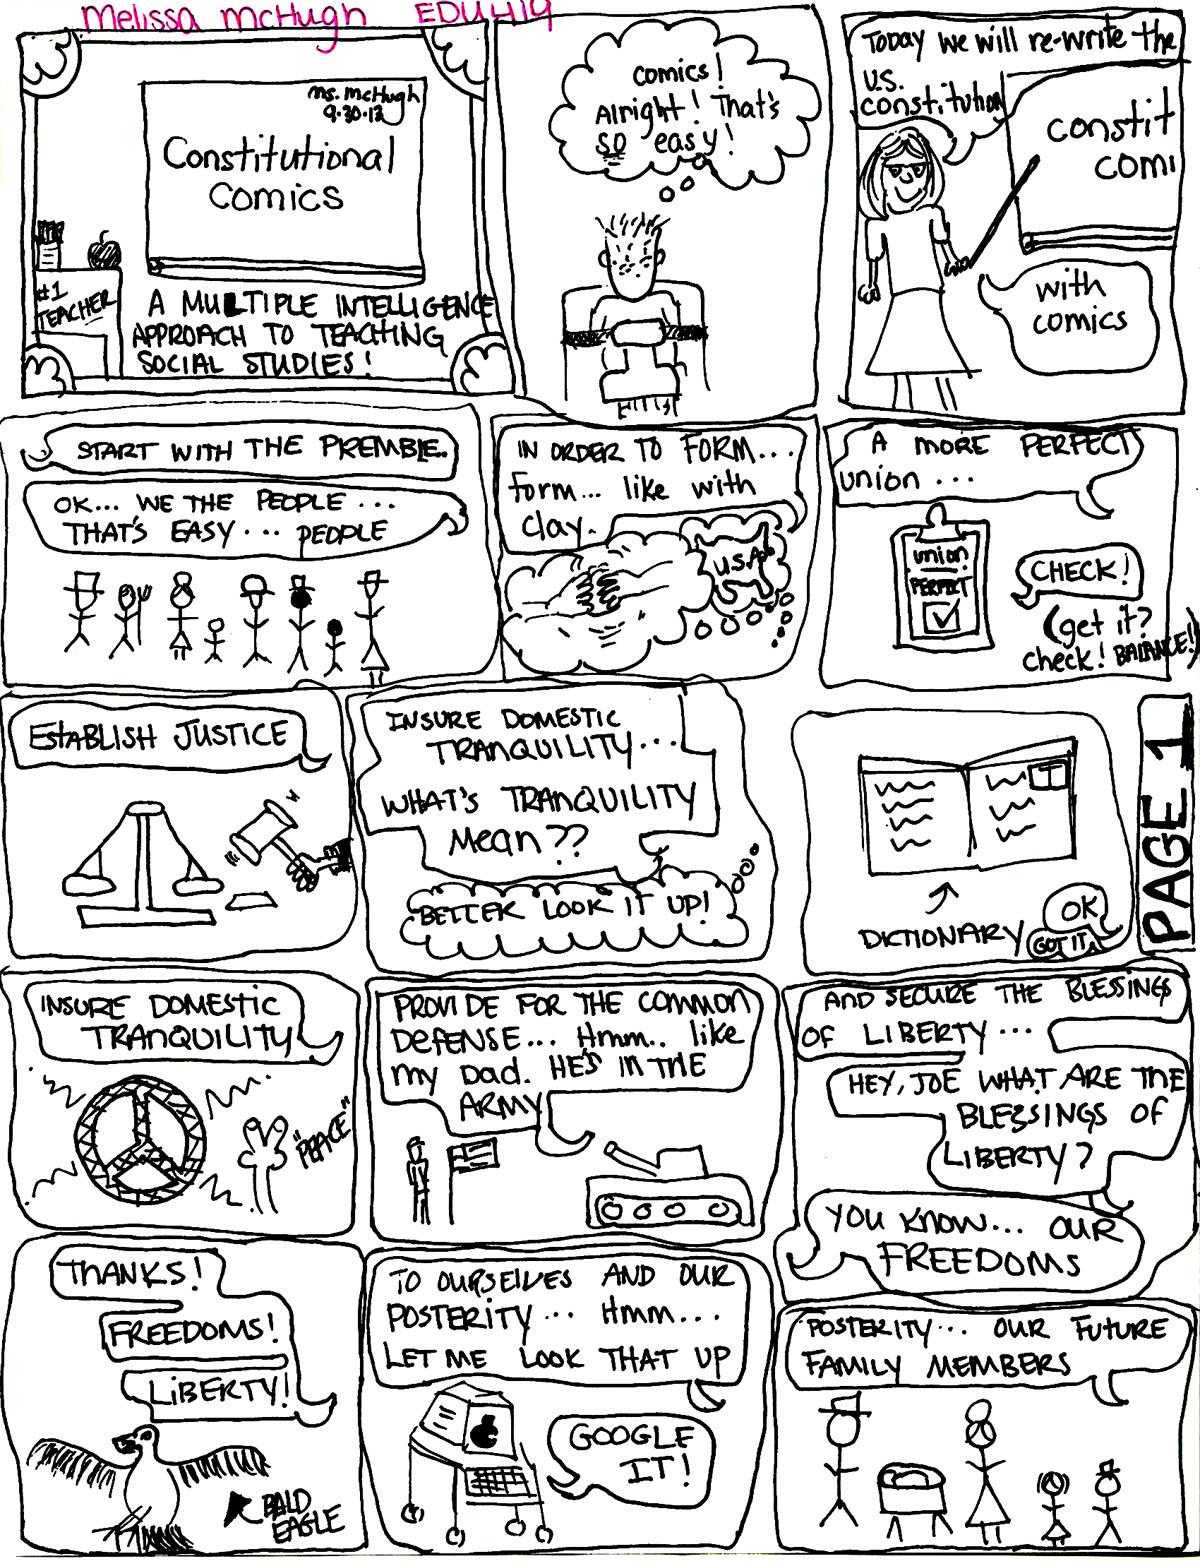 Constitutional Comics By Melissa Mchugh